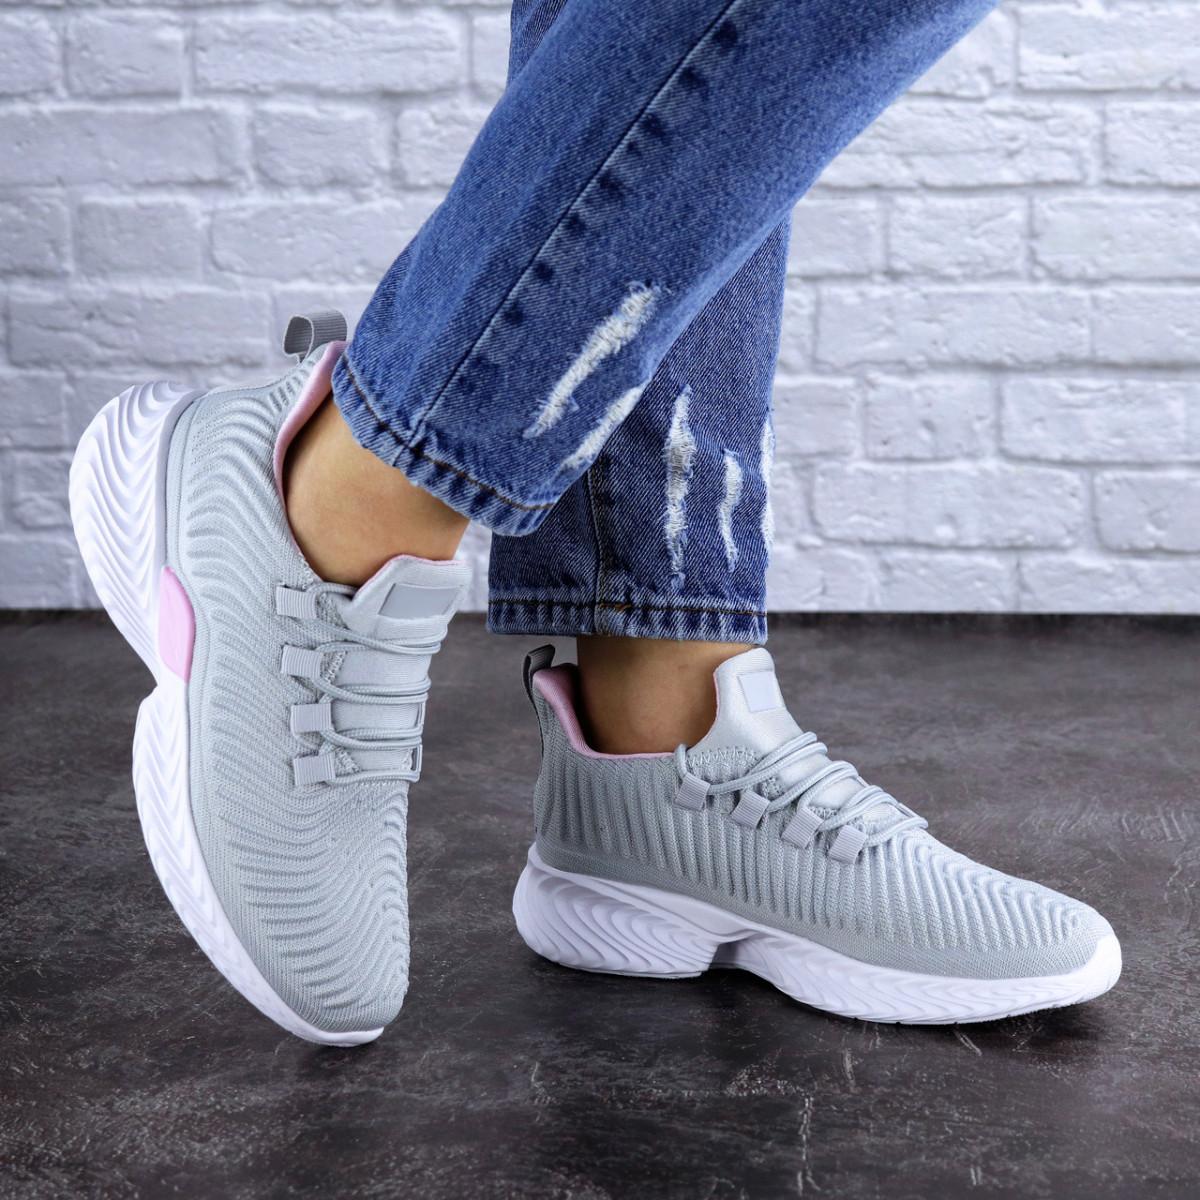 Женские кроссовки Fashion Ripple 1730 36 размер 23,5 см Серый